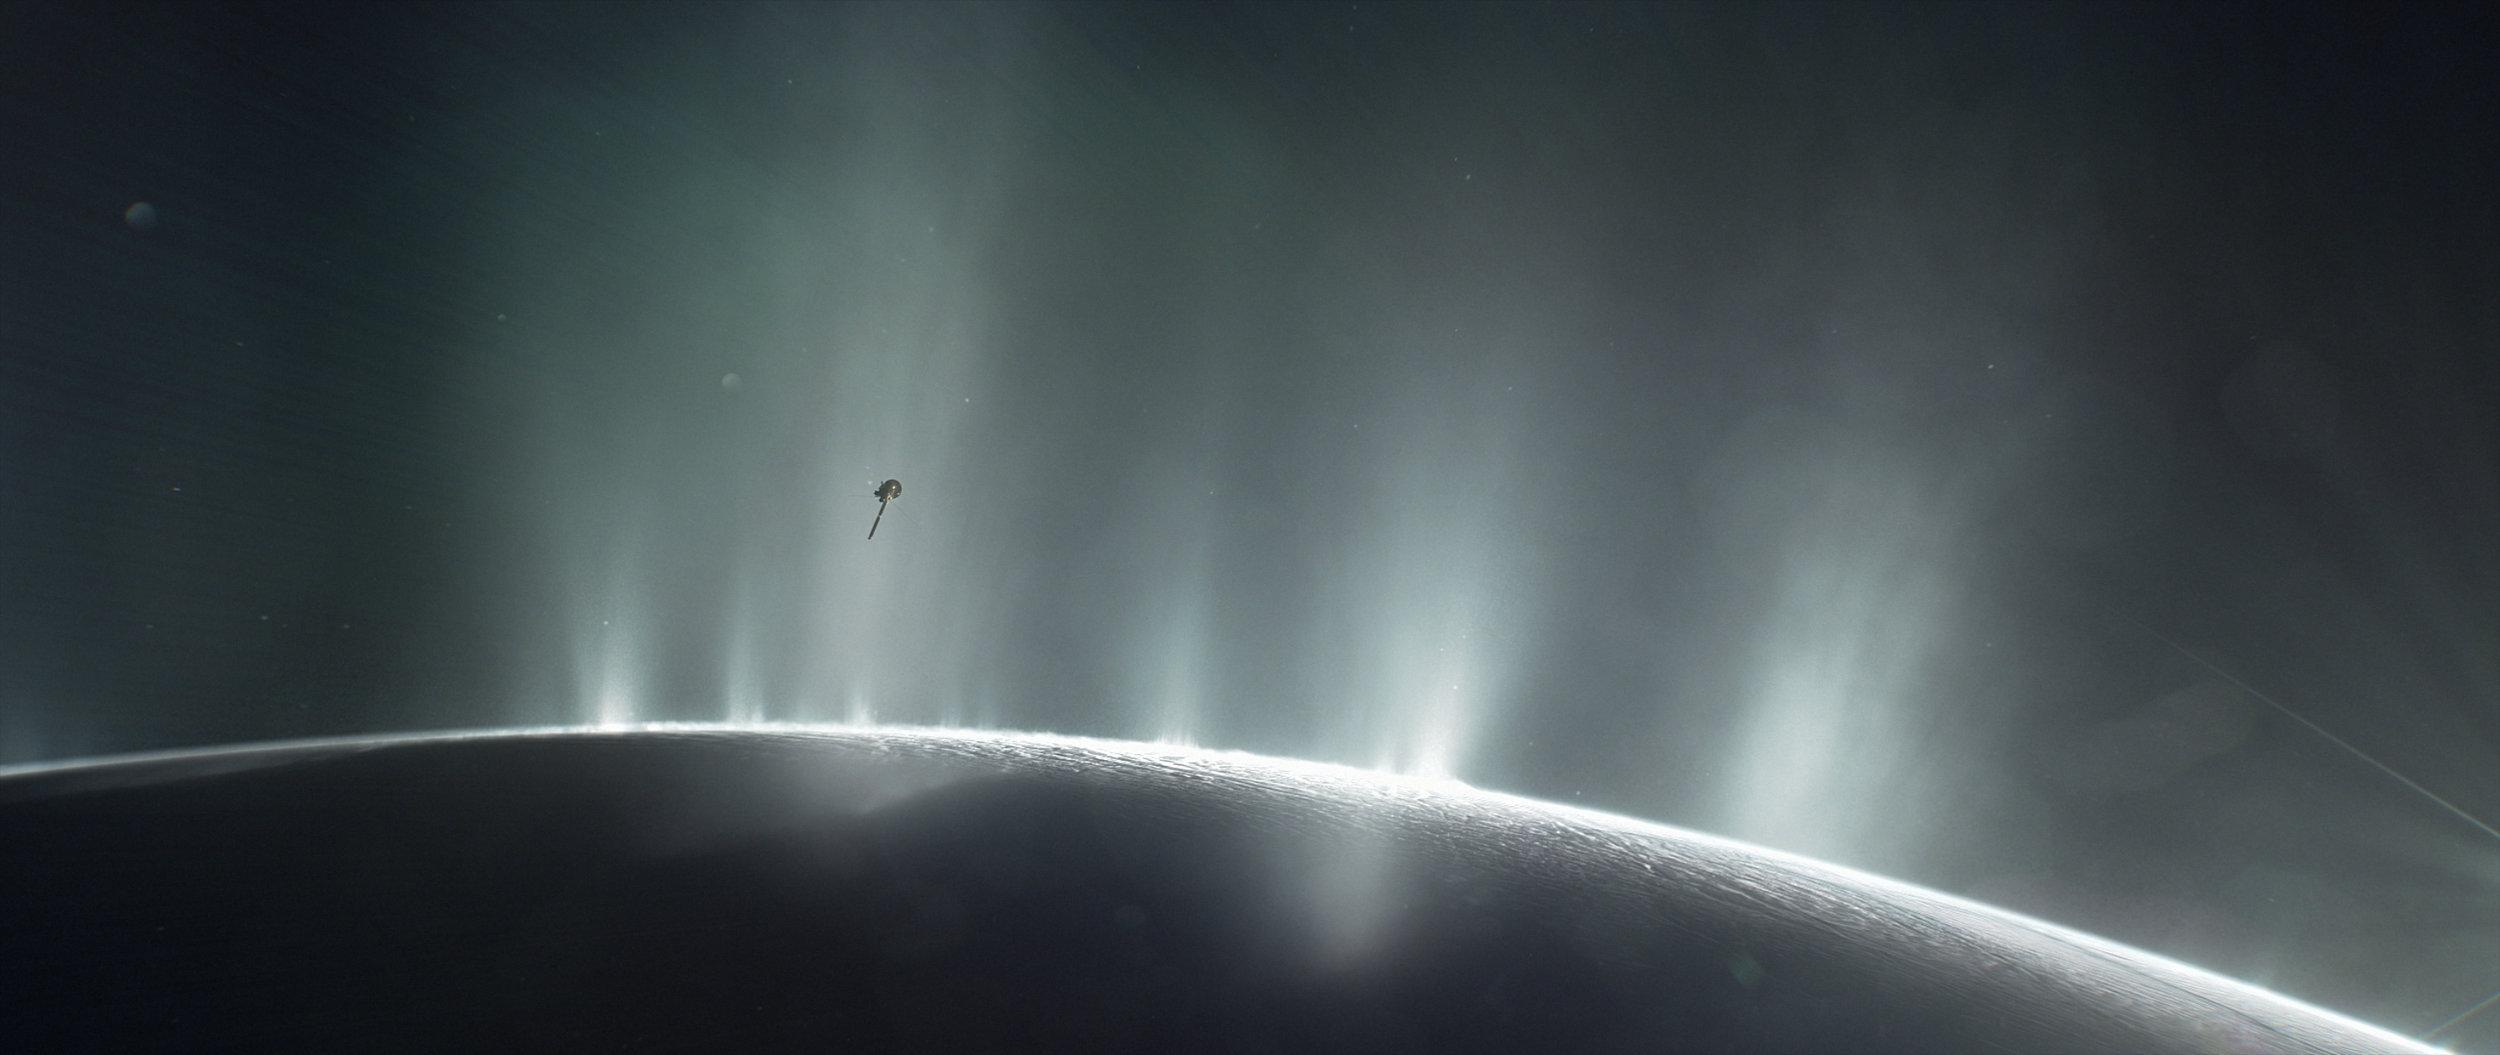 An illustration of Cassini diving through geysers on Enceladus (credits: NASA/JPL-Caltech)